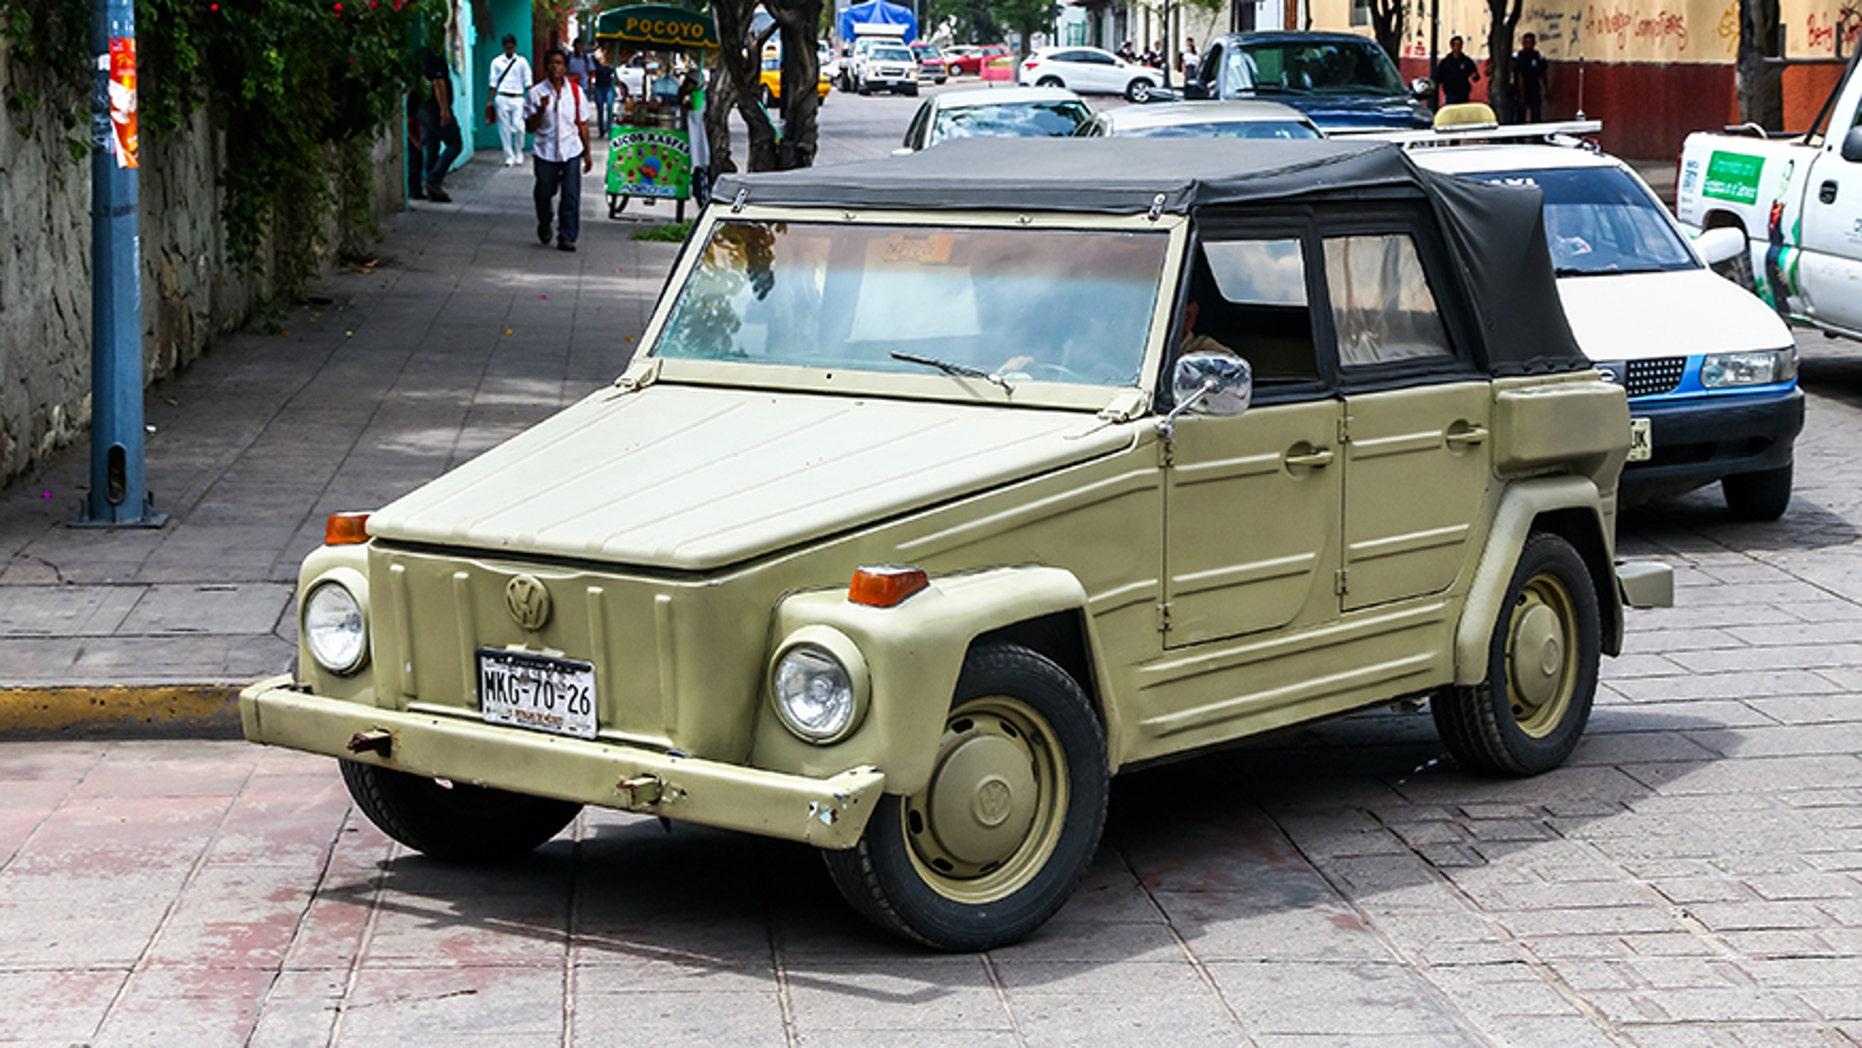 OAXACA, MEXICO - MAY 25, 2017: Motor car Volkswagen Safari in the city street.